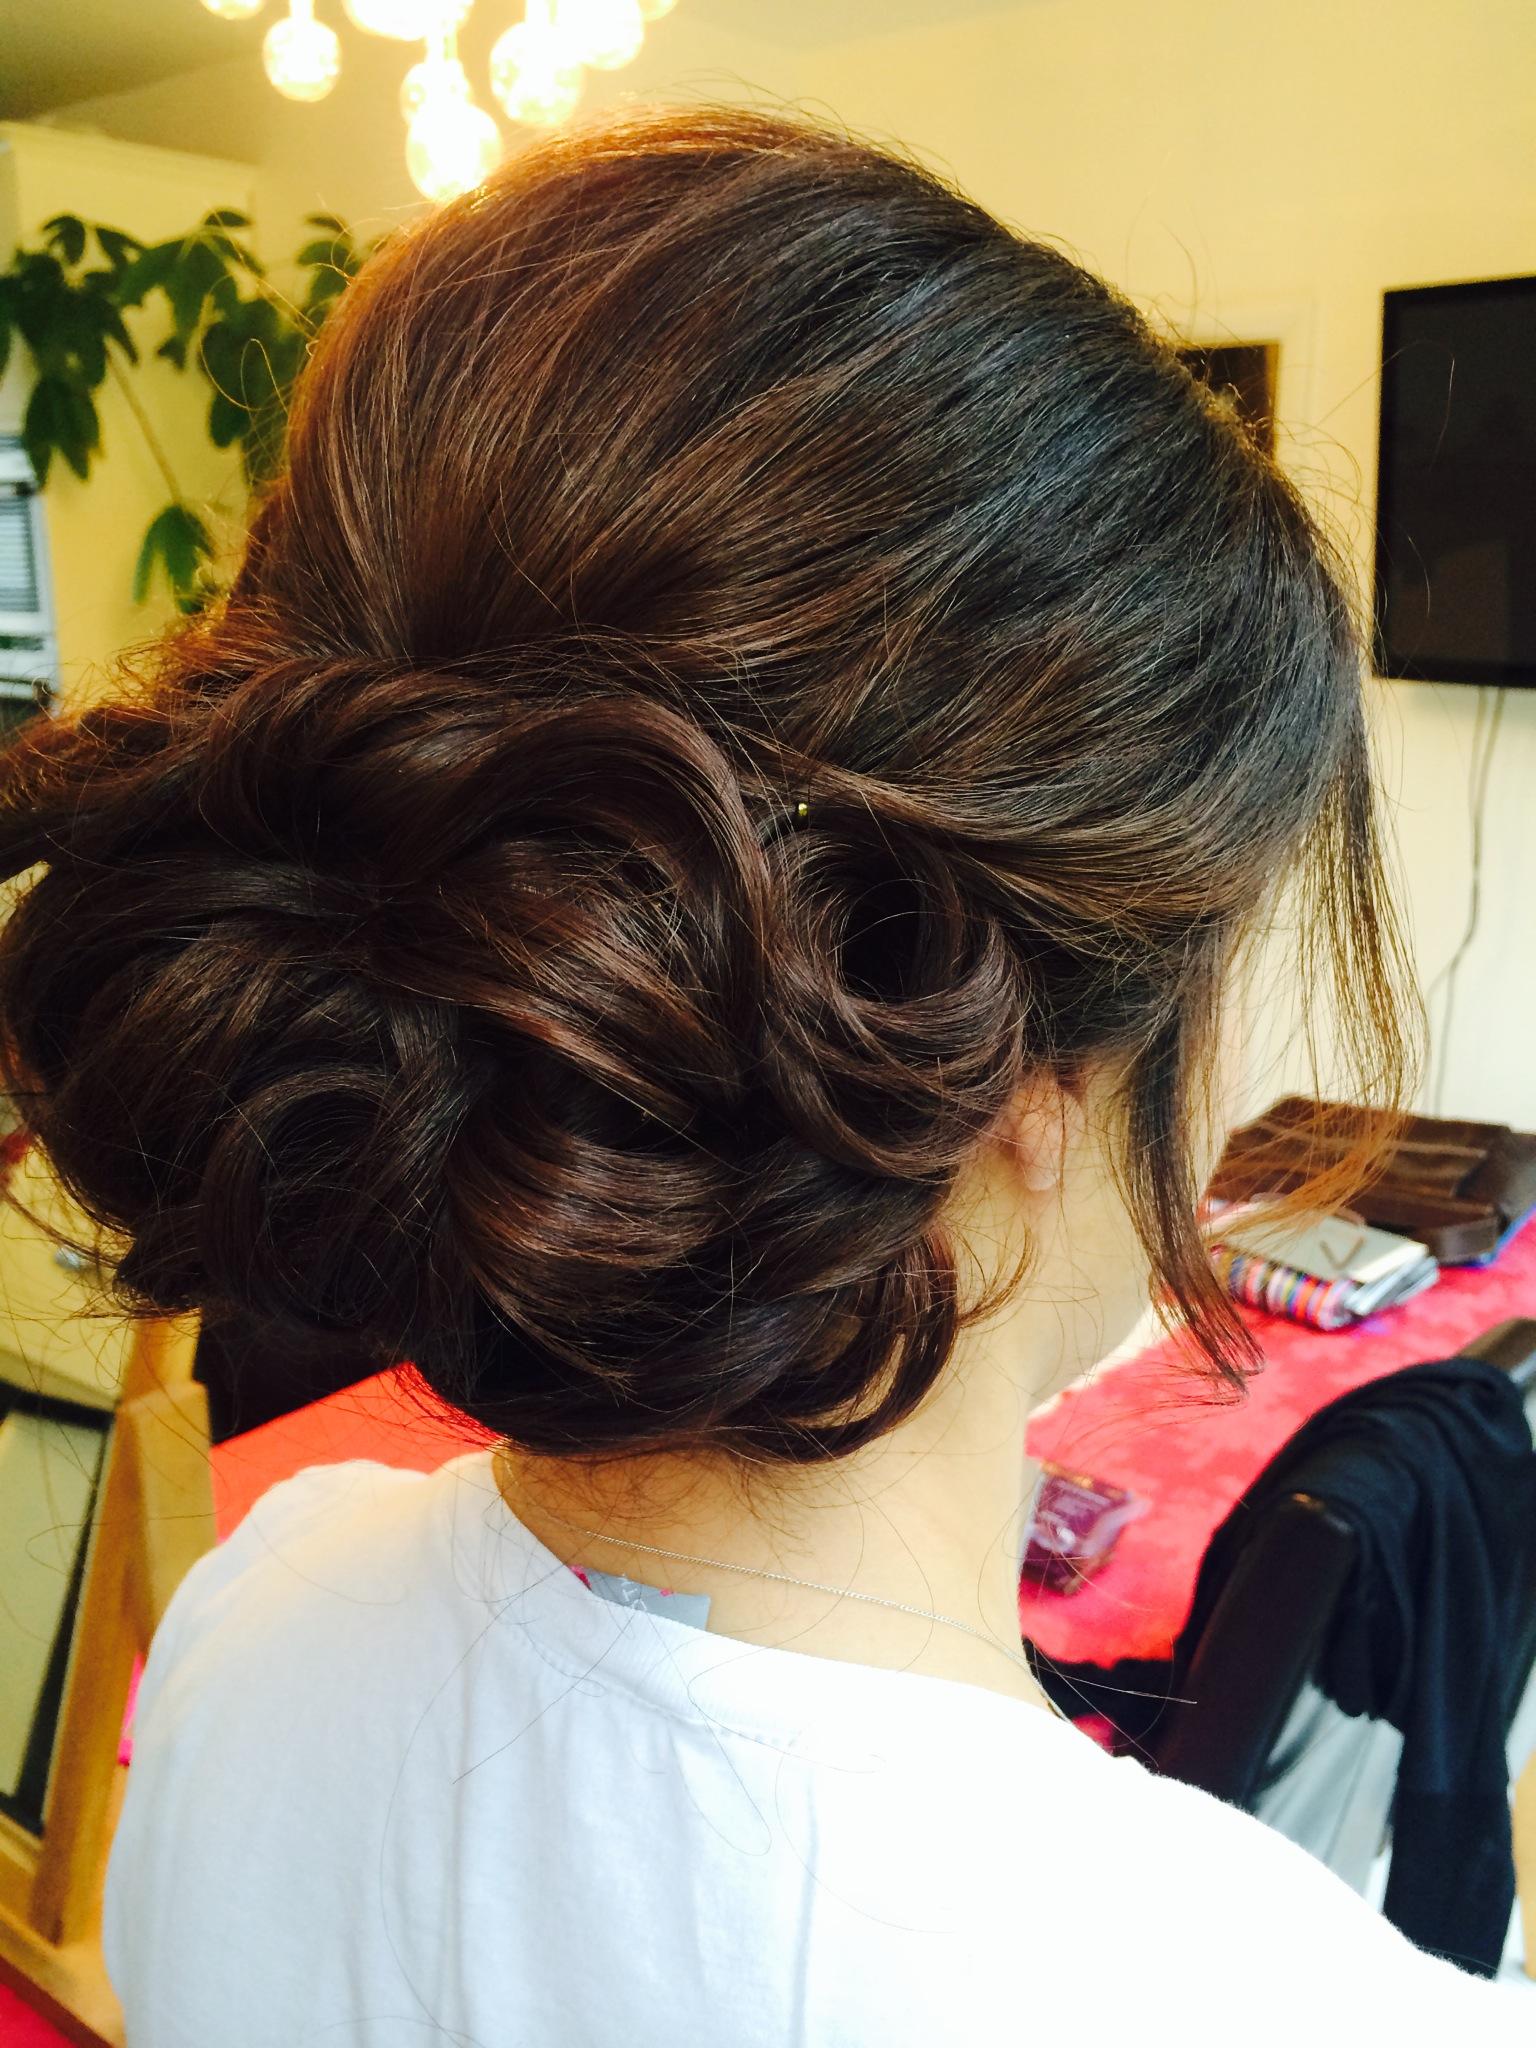 Surrey hair